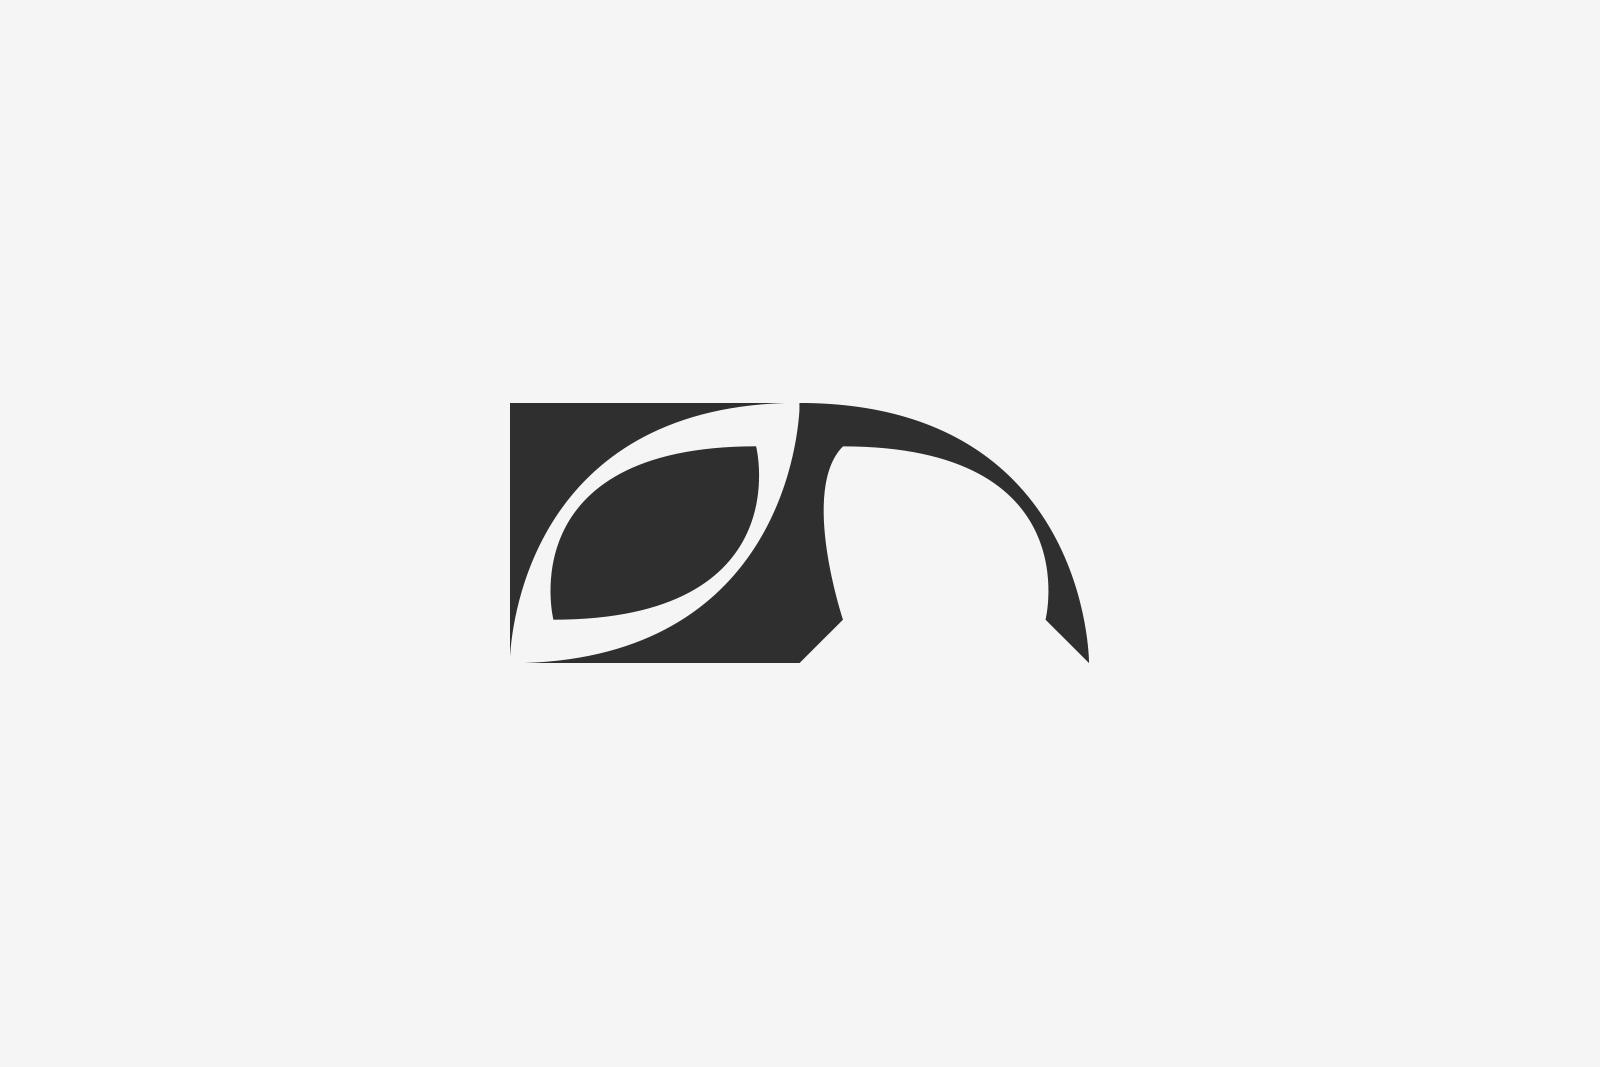 Logo Oscar Niemeyer Bw